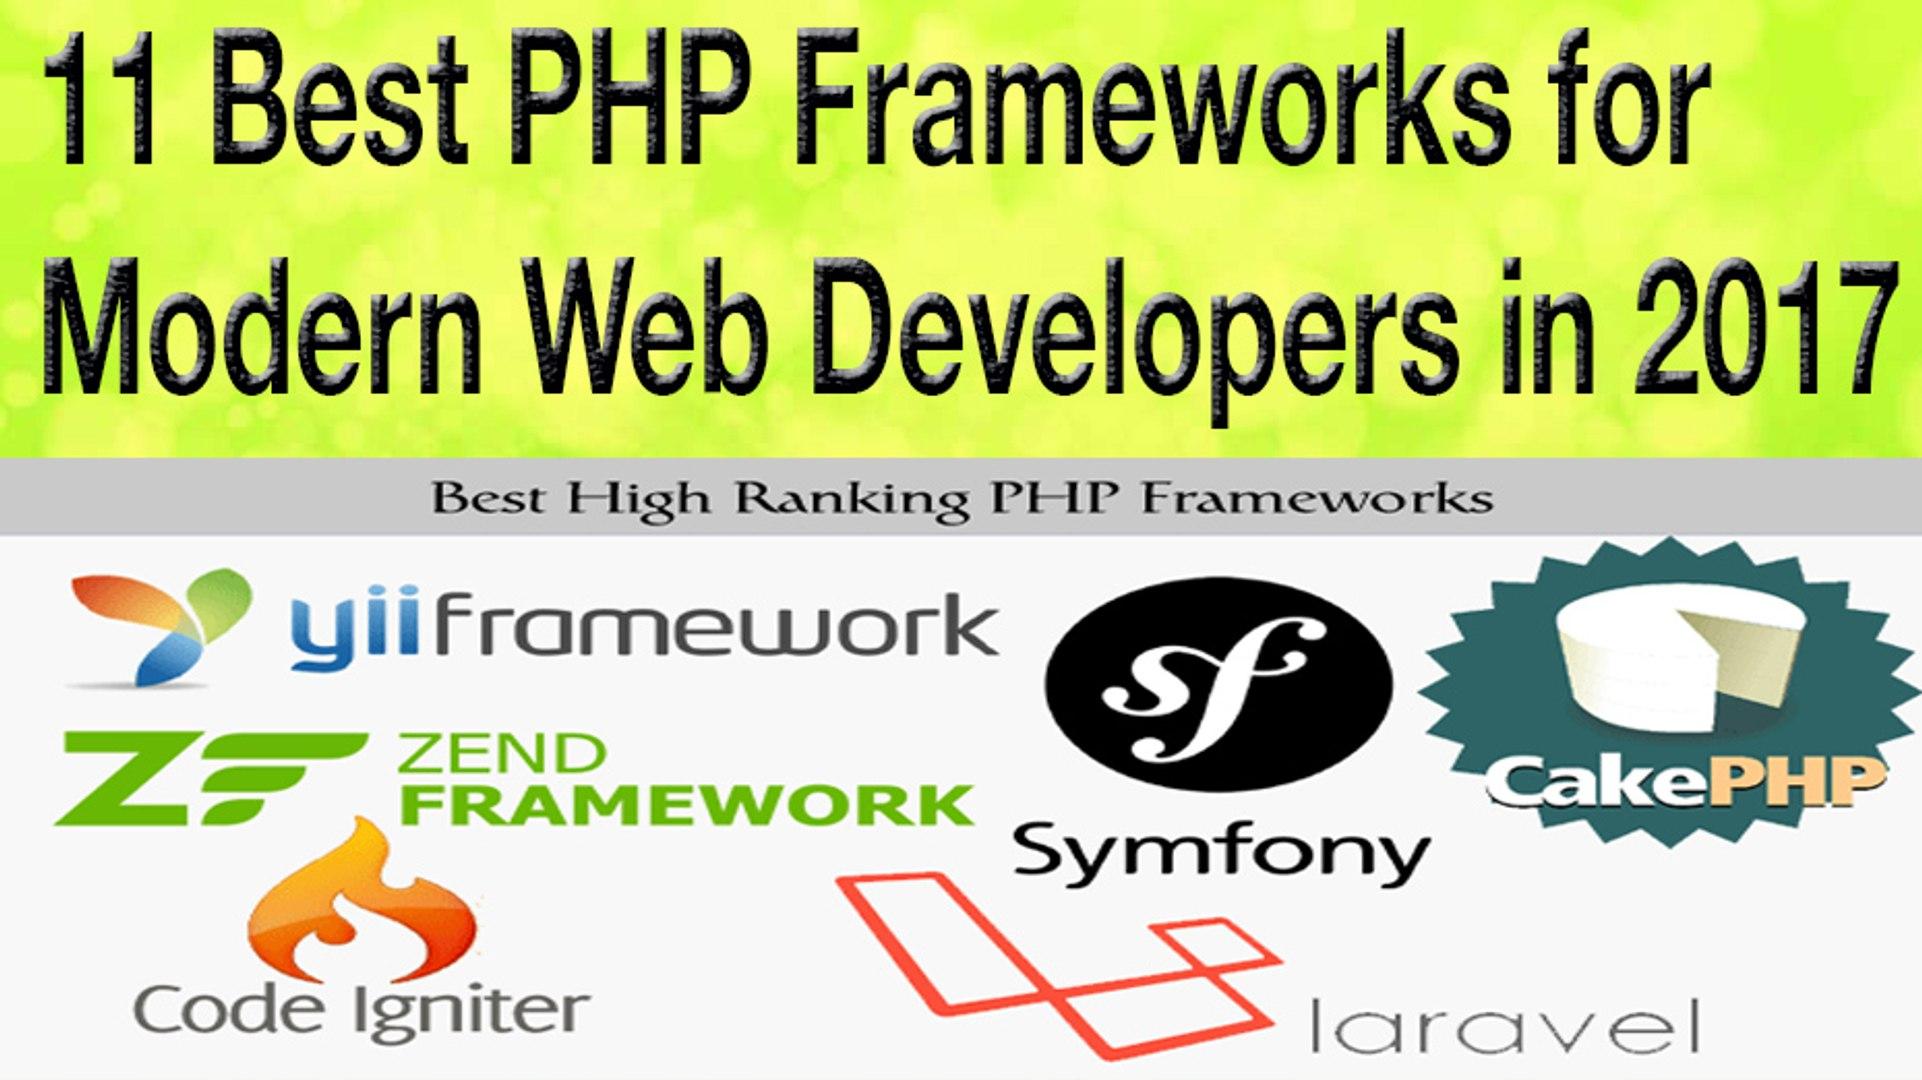 11 Best PHP Frameworks for Modern Web Developers in 2017